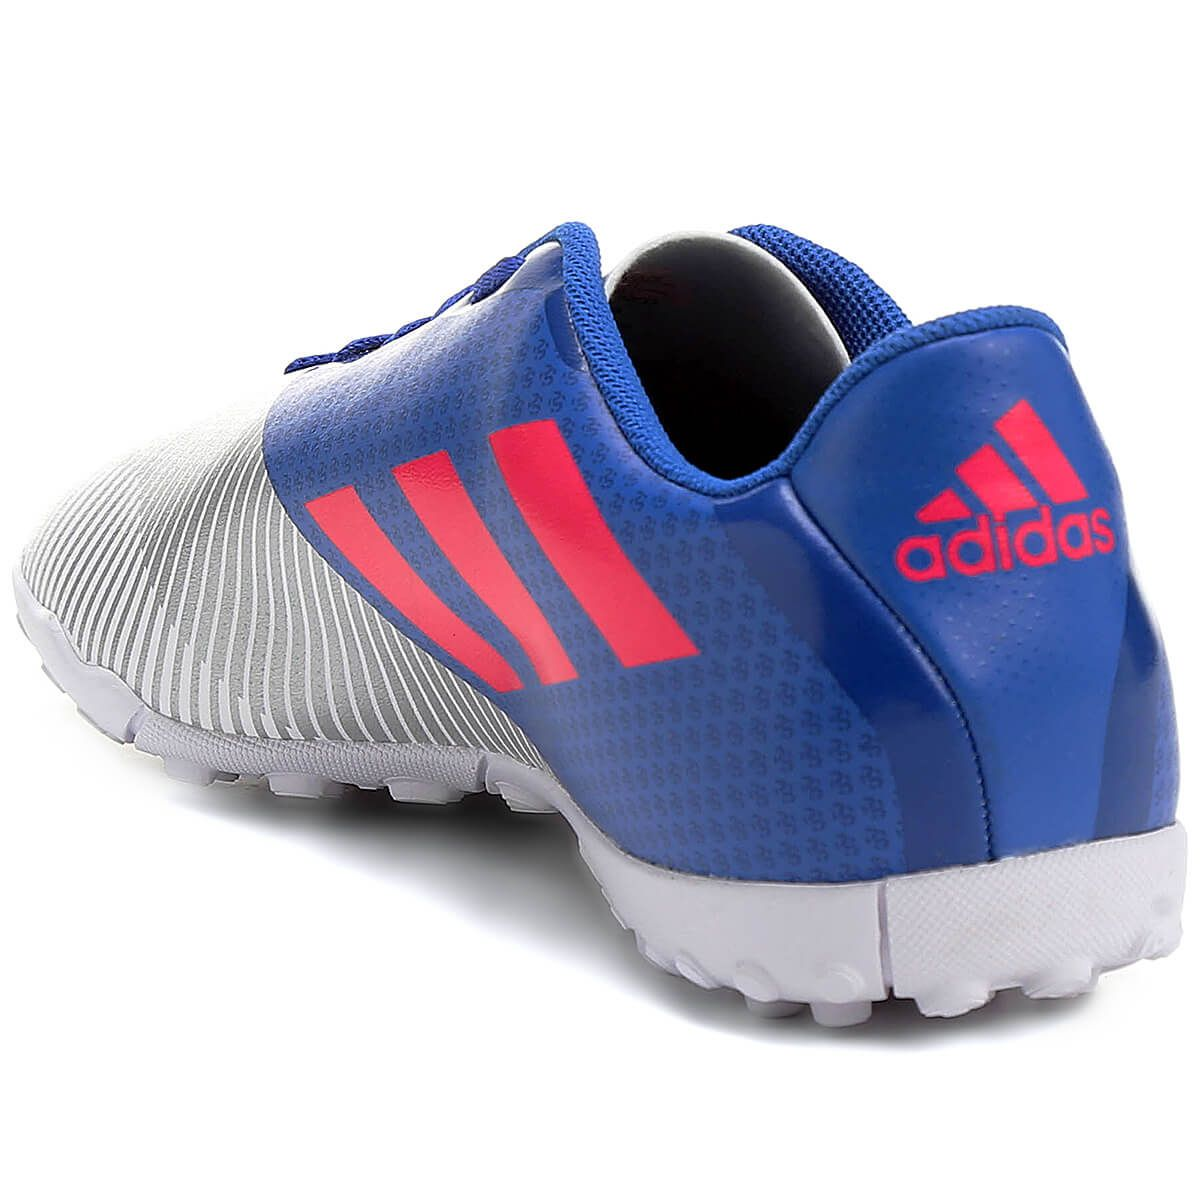 ba3d4c159c Chuteira Society Adidas Artilheira 17 Tf - BRACIA SHOP  Loja de ...